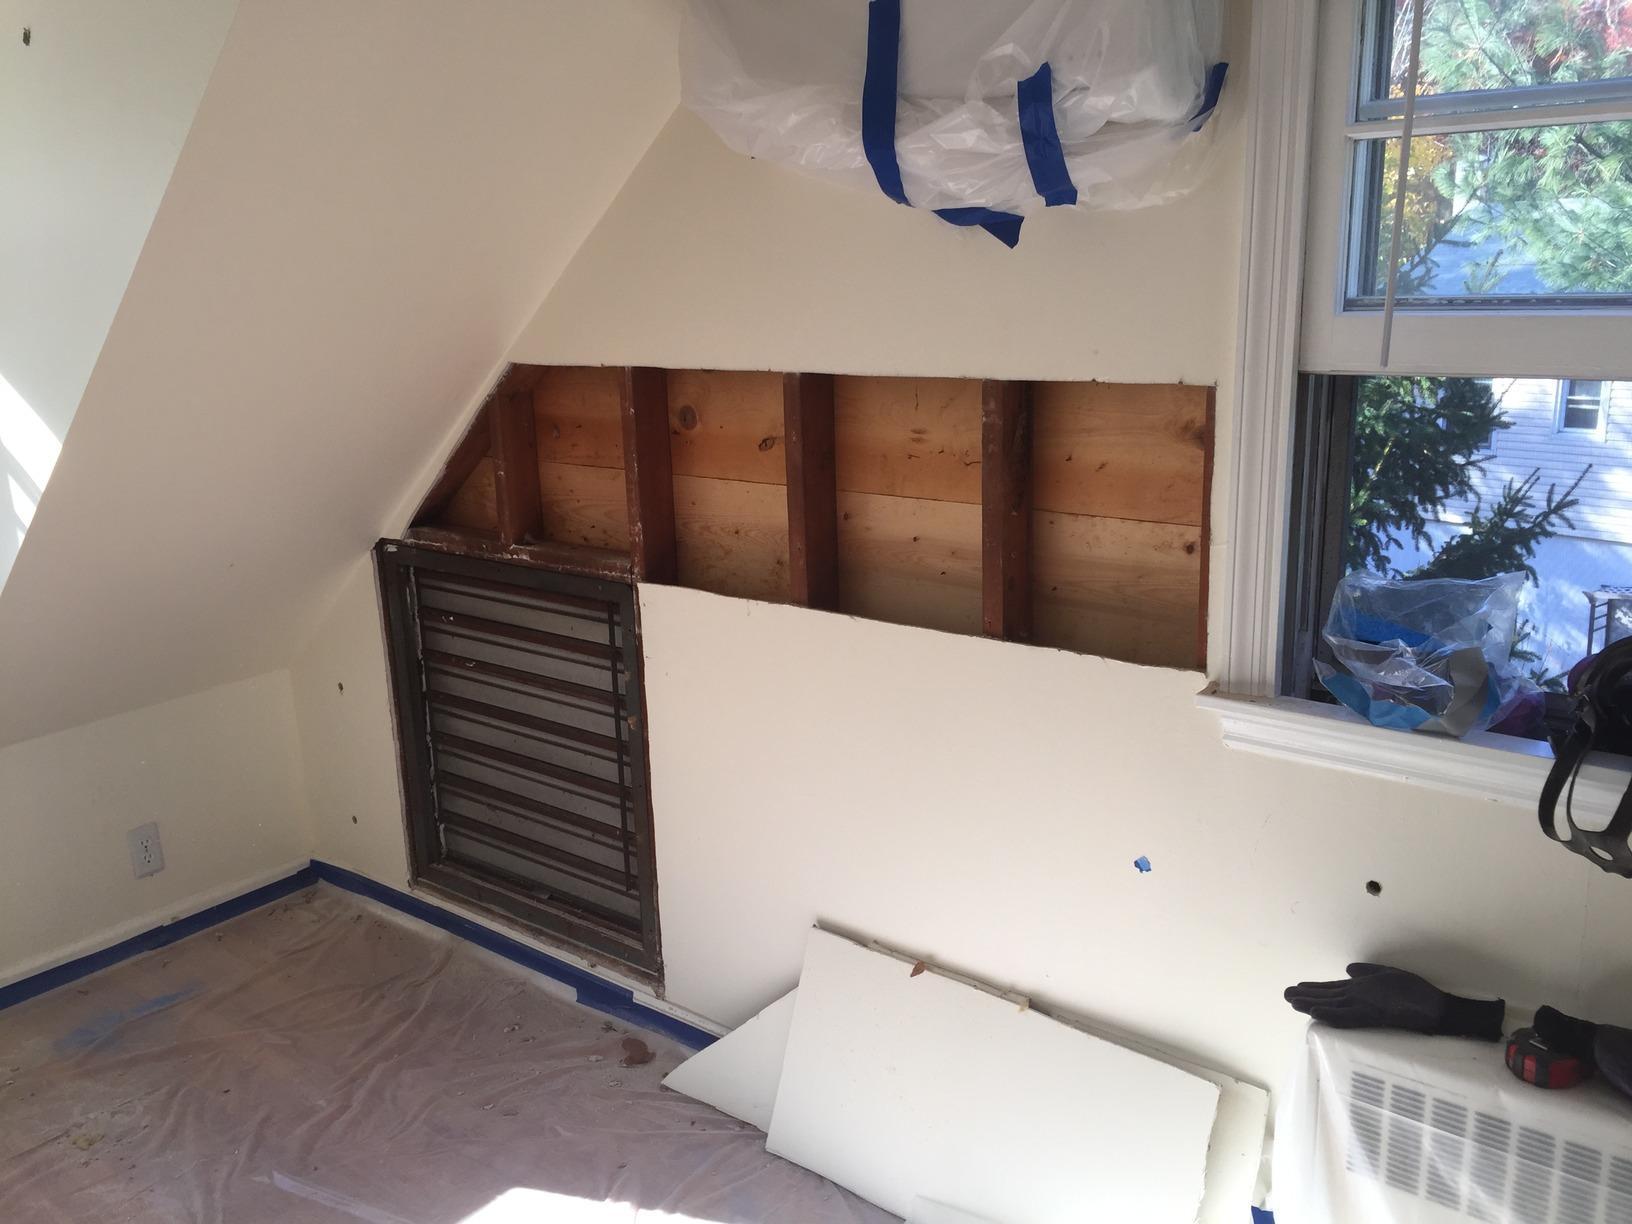 Removing Fiber Glass Insulation & Installing Spray Foam Insulation To Regain Comfort - Sloatsburg, NY - Before Photo